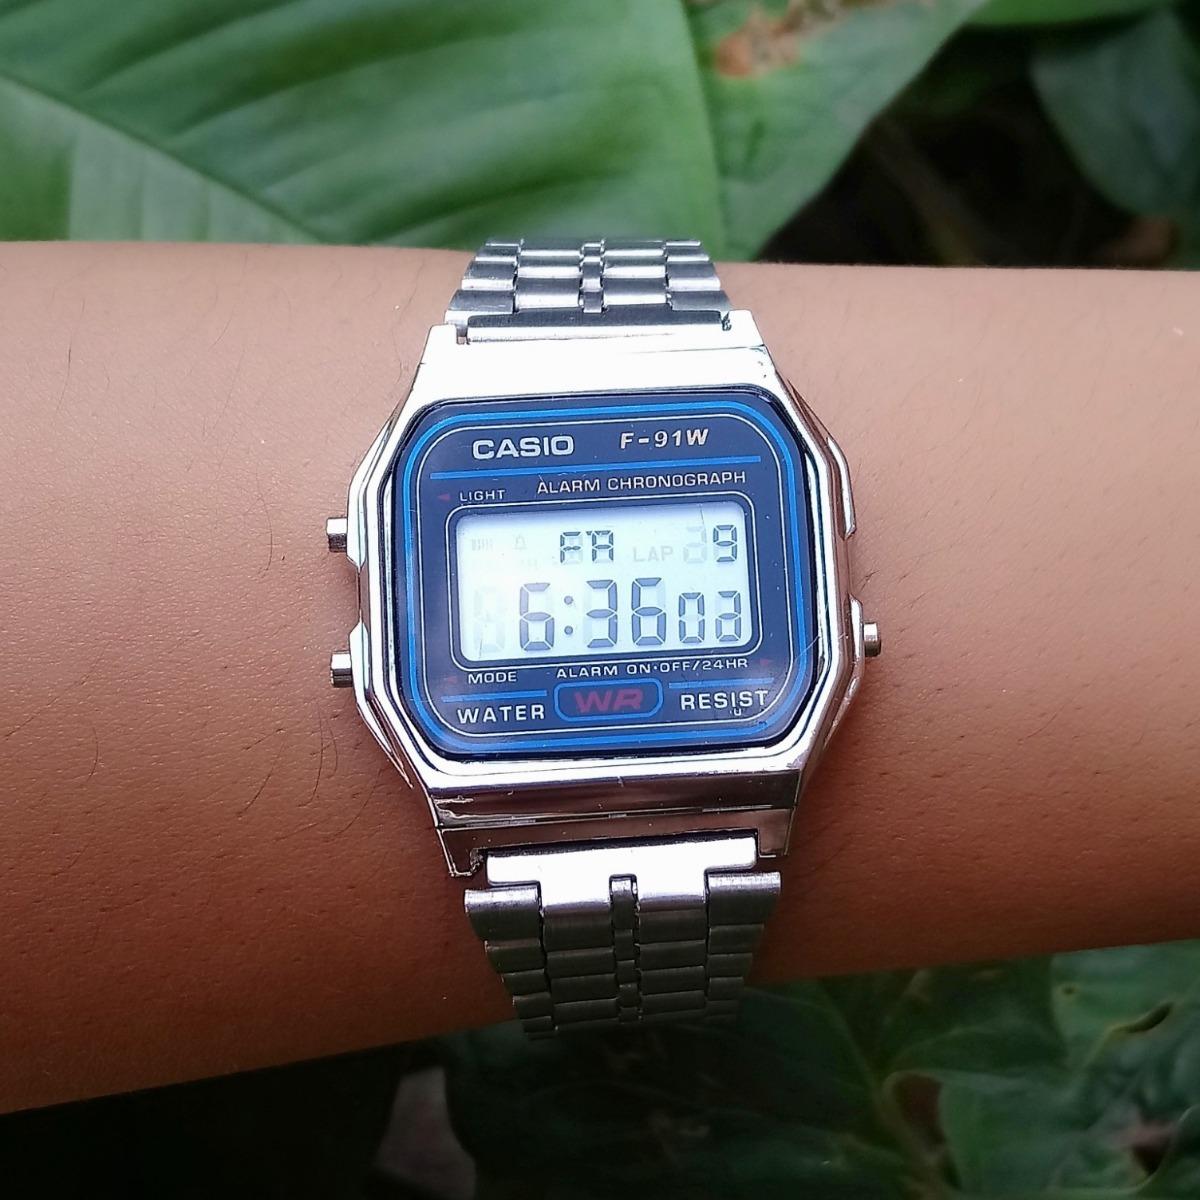 a0c5d77cf99 Relógio Feminino Casio Vintage Prateado Digital - R  120